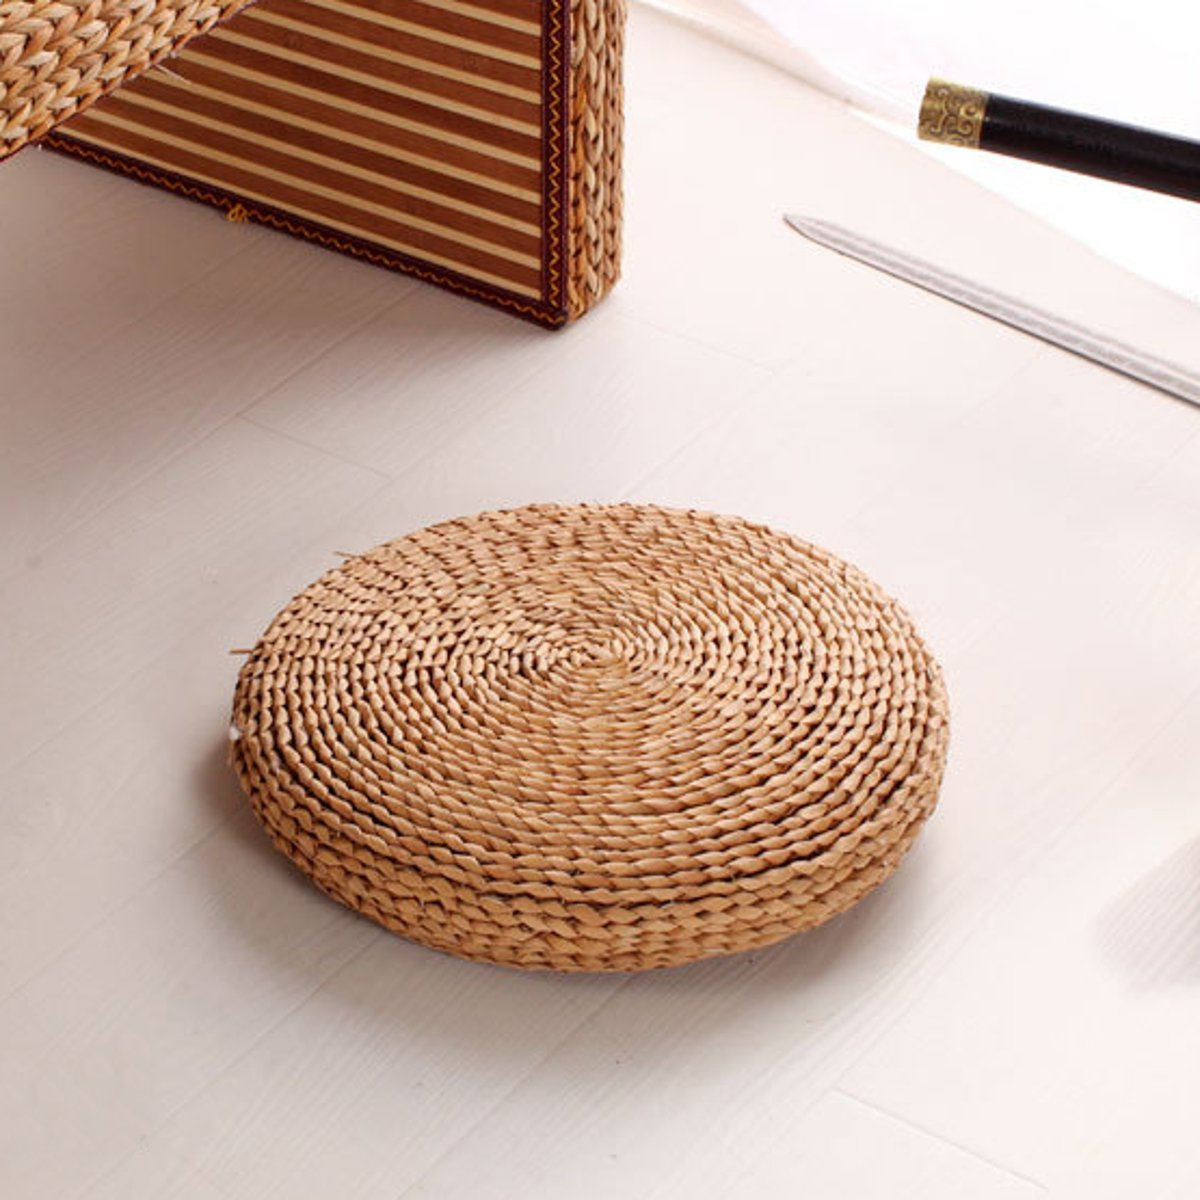 30/40/45cm Round Natural Straw Weave Handmade Pillow Floor Yoga Chair Seat Mat Tatami Cushion Thicken Meditation Window Cushion